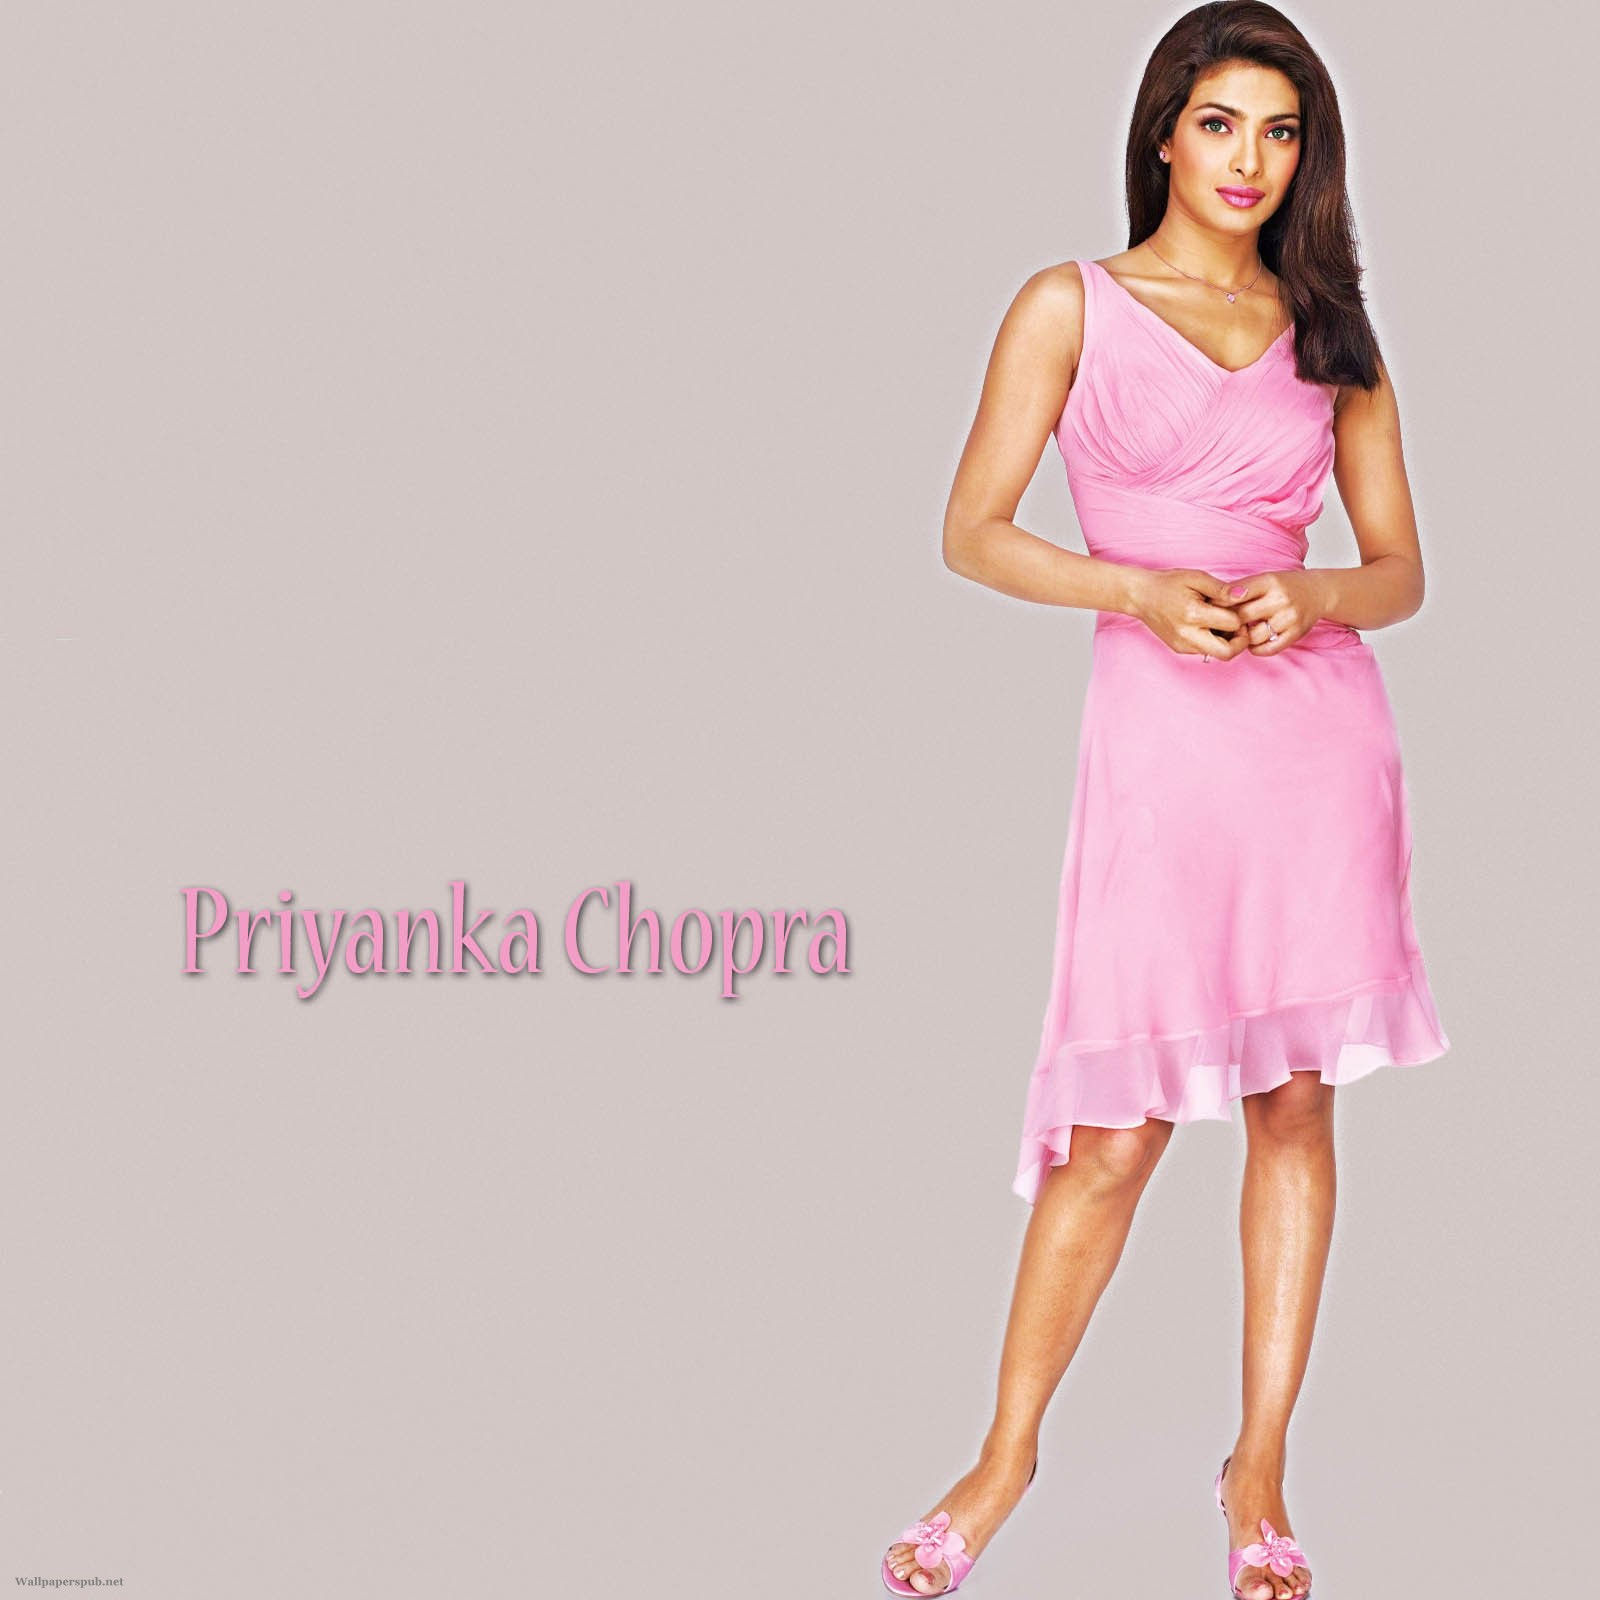 http://4.bp.blogspot.com/-az9hiCAqmg0/TuOVT-qjrZI/AAAAAAAAC_c/IDA_NYj_E6Q/s1600/Don2_Priyanka_chopra_wallpapers_dance.jpg